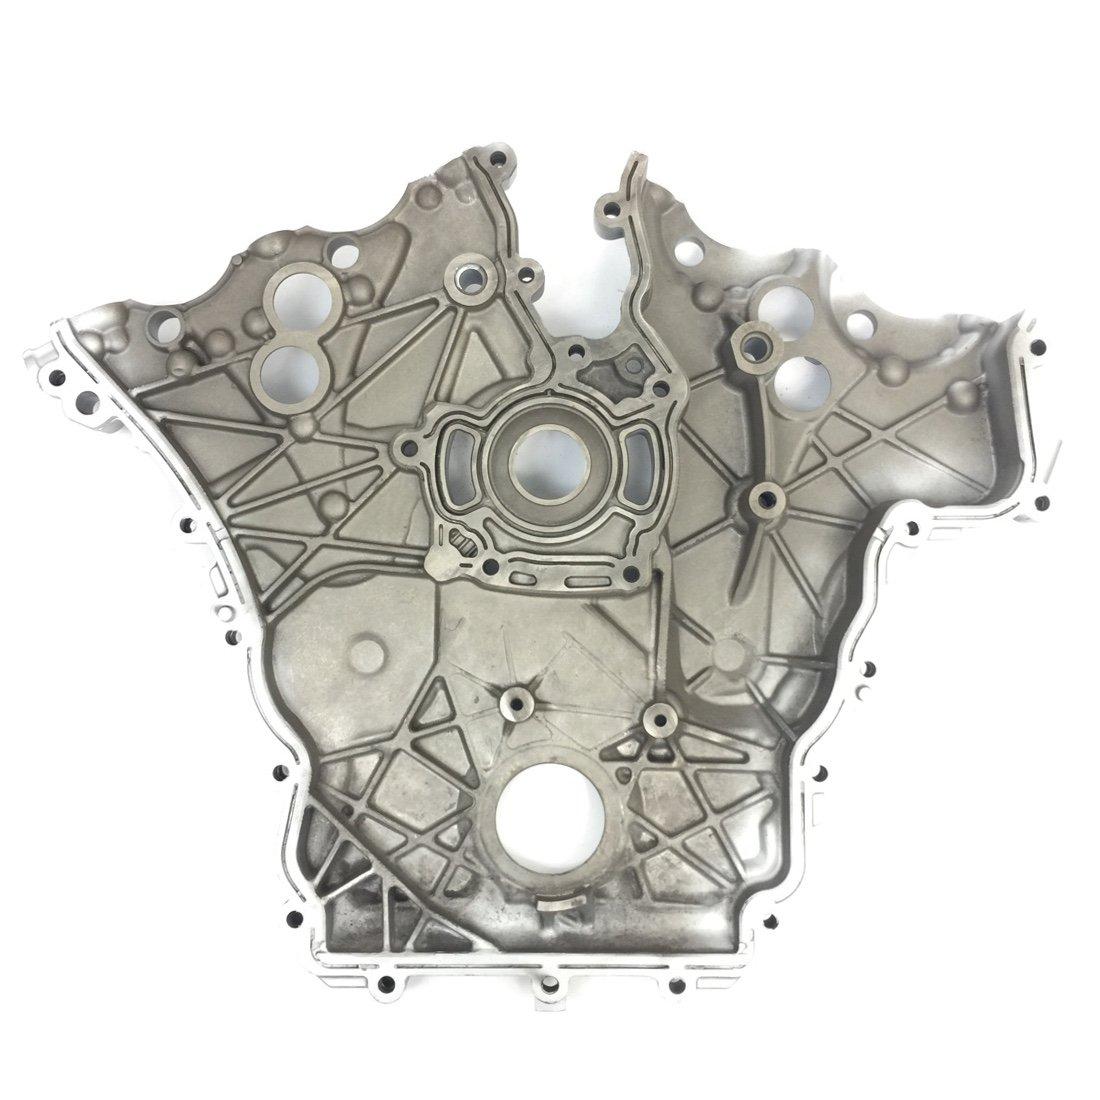 Gm Oem Timing Cover 10 16 30l 36l Coloradoequinox Iron Duke Engine Diagram Impala Malibu Traverse 12643744 Automotive